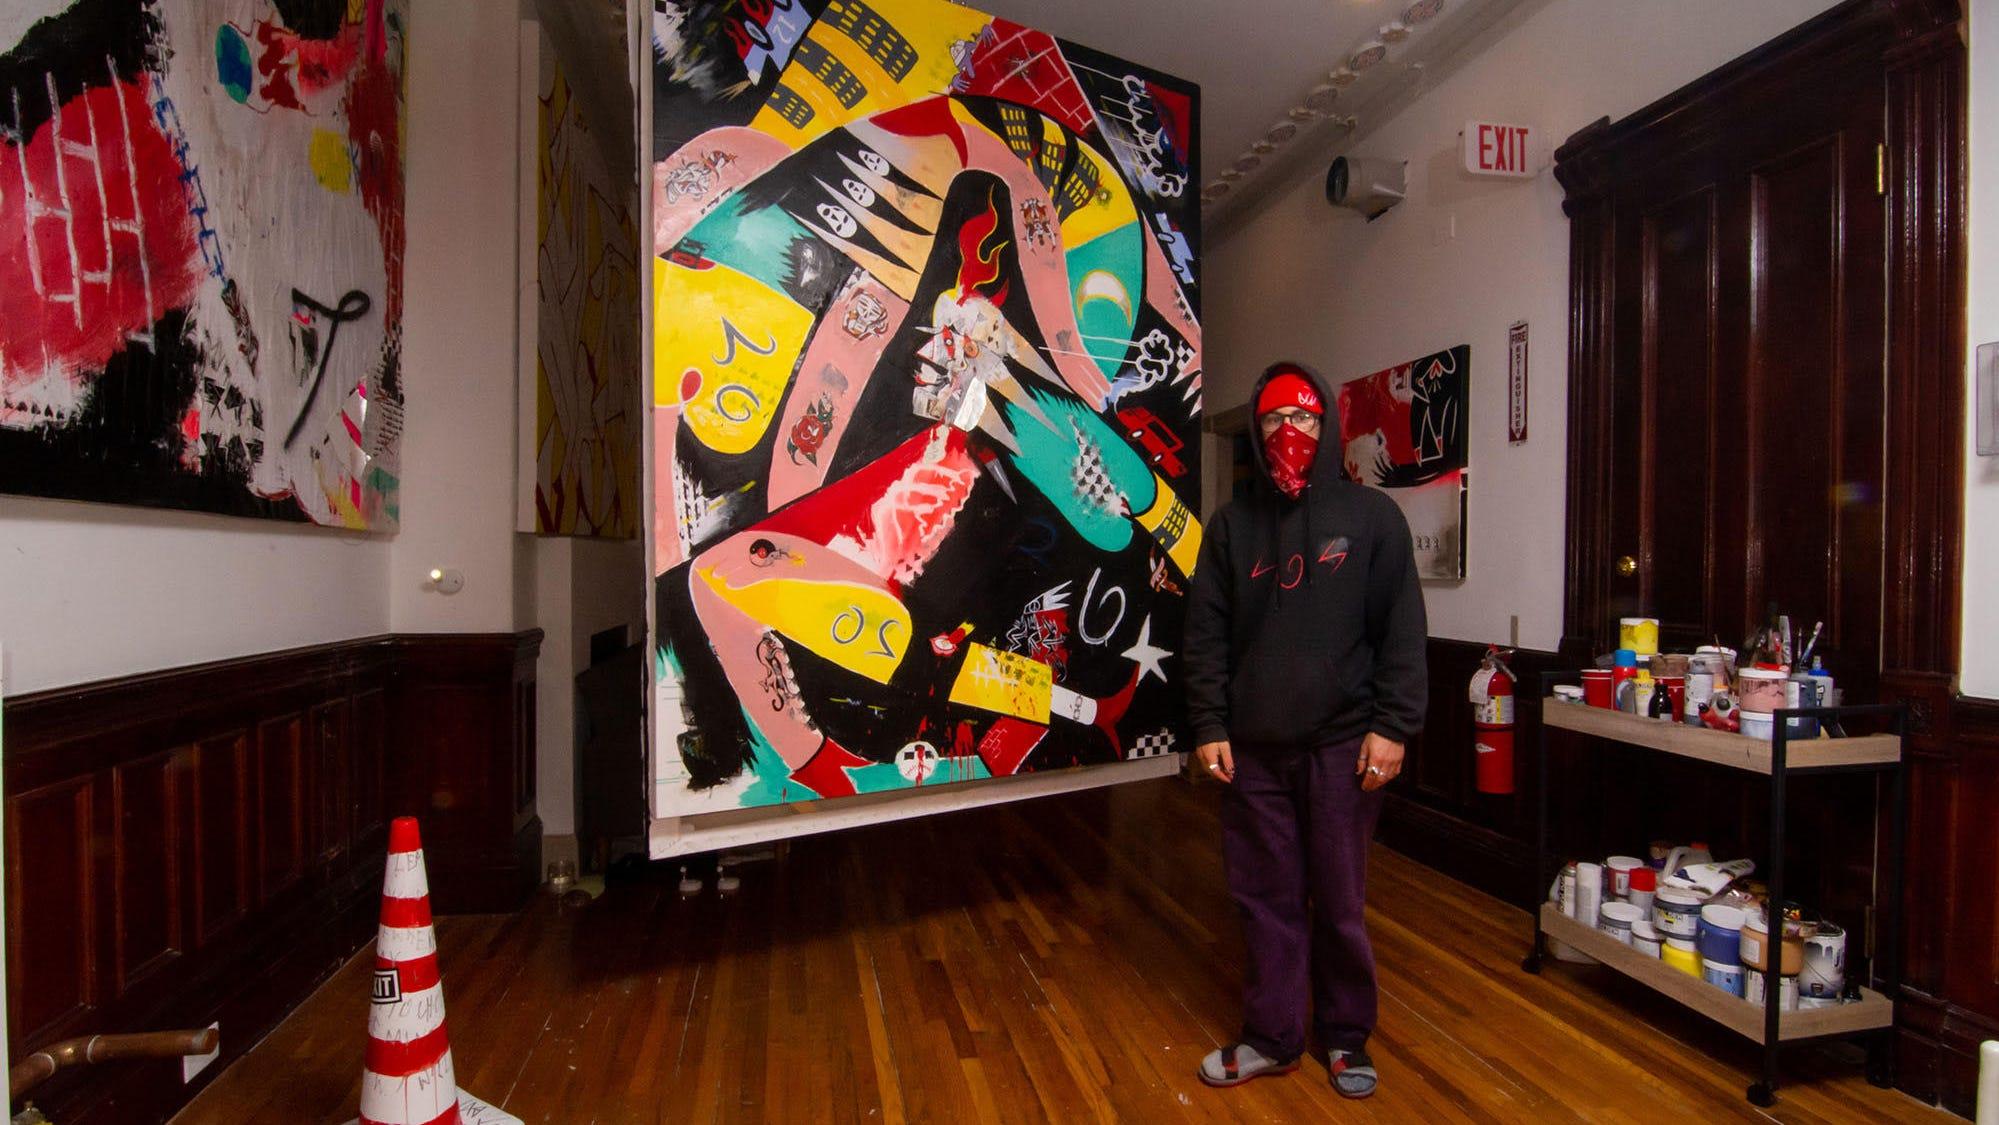 Brookline artist Sam Fish wants to shake up the local art scene